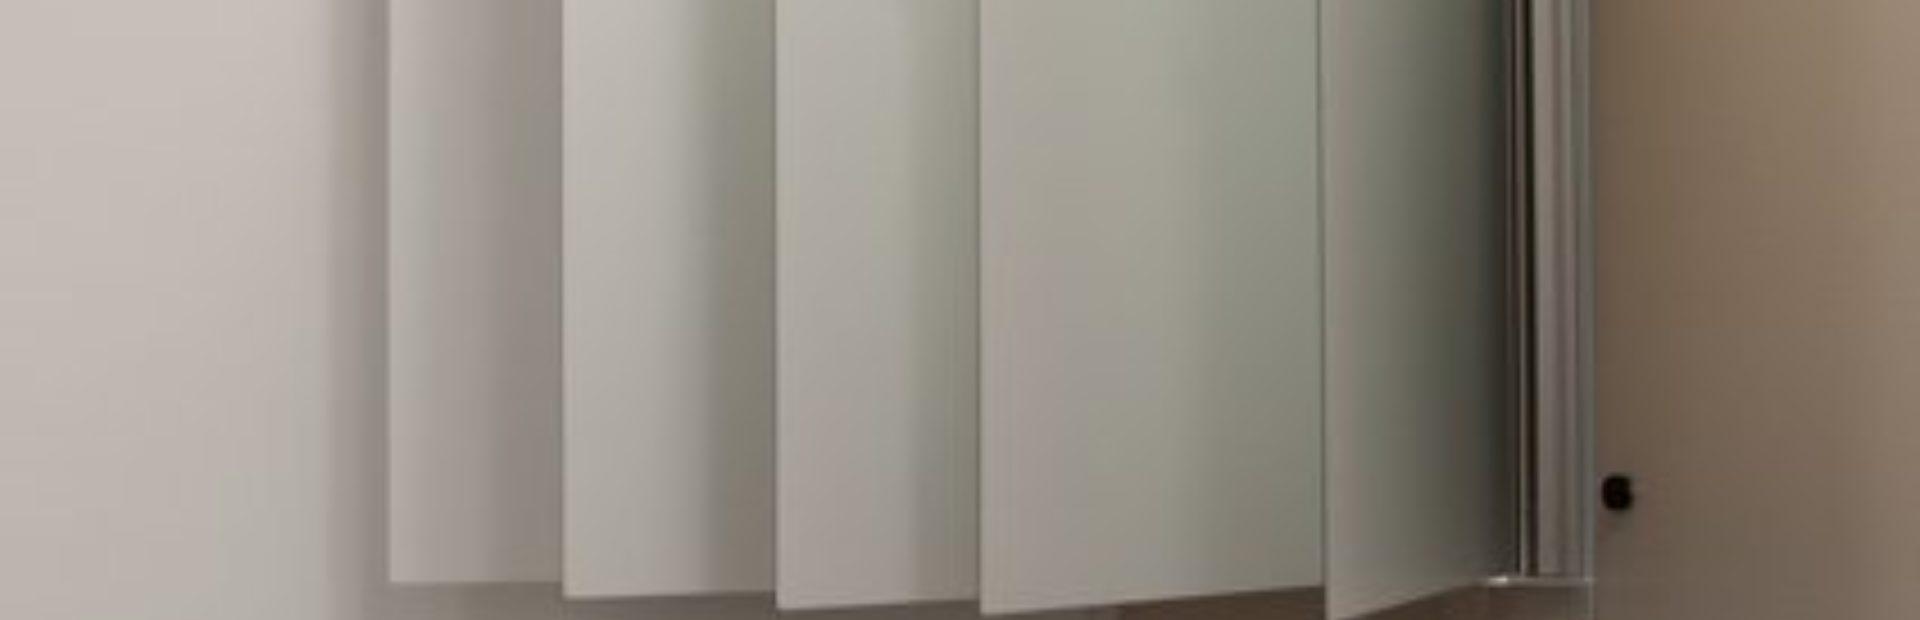 Tafelfächer Schwenktafel